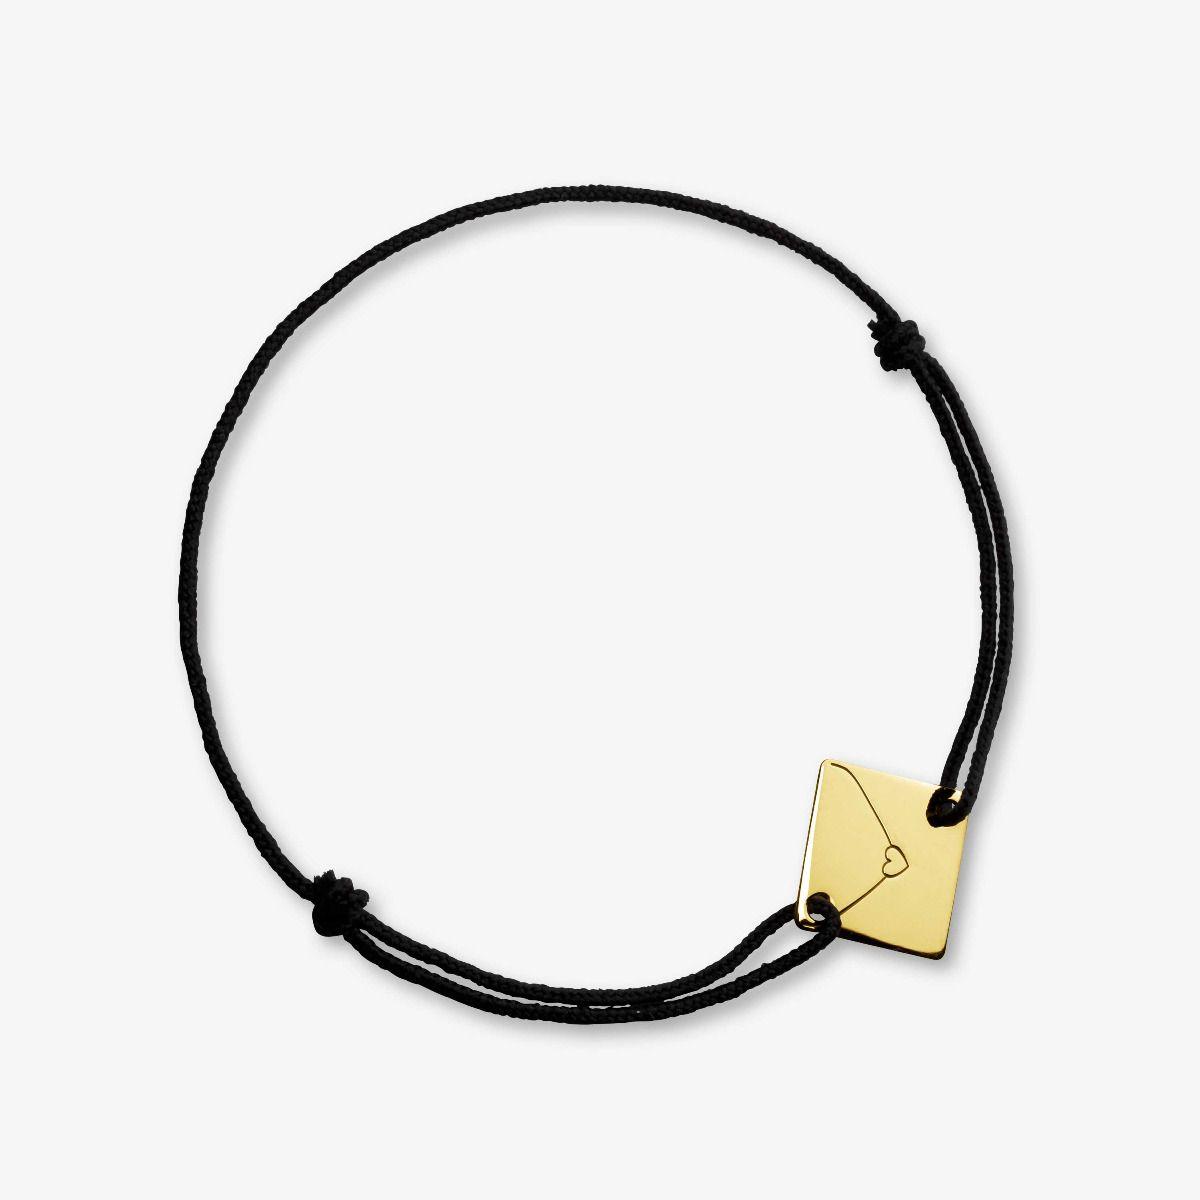 Bracelet cordon Enveloppe Or Jaune 18 carats